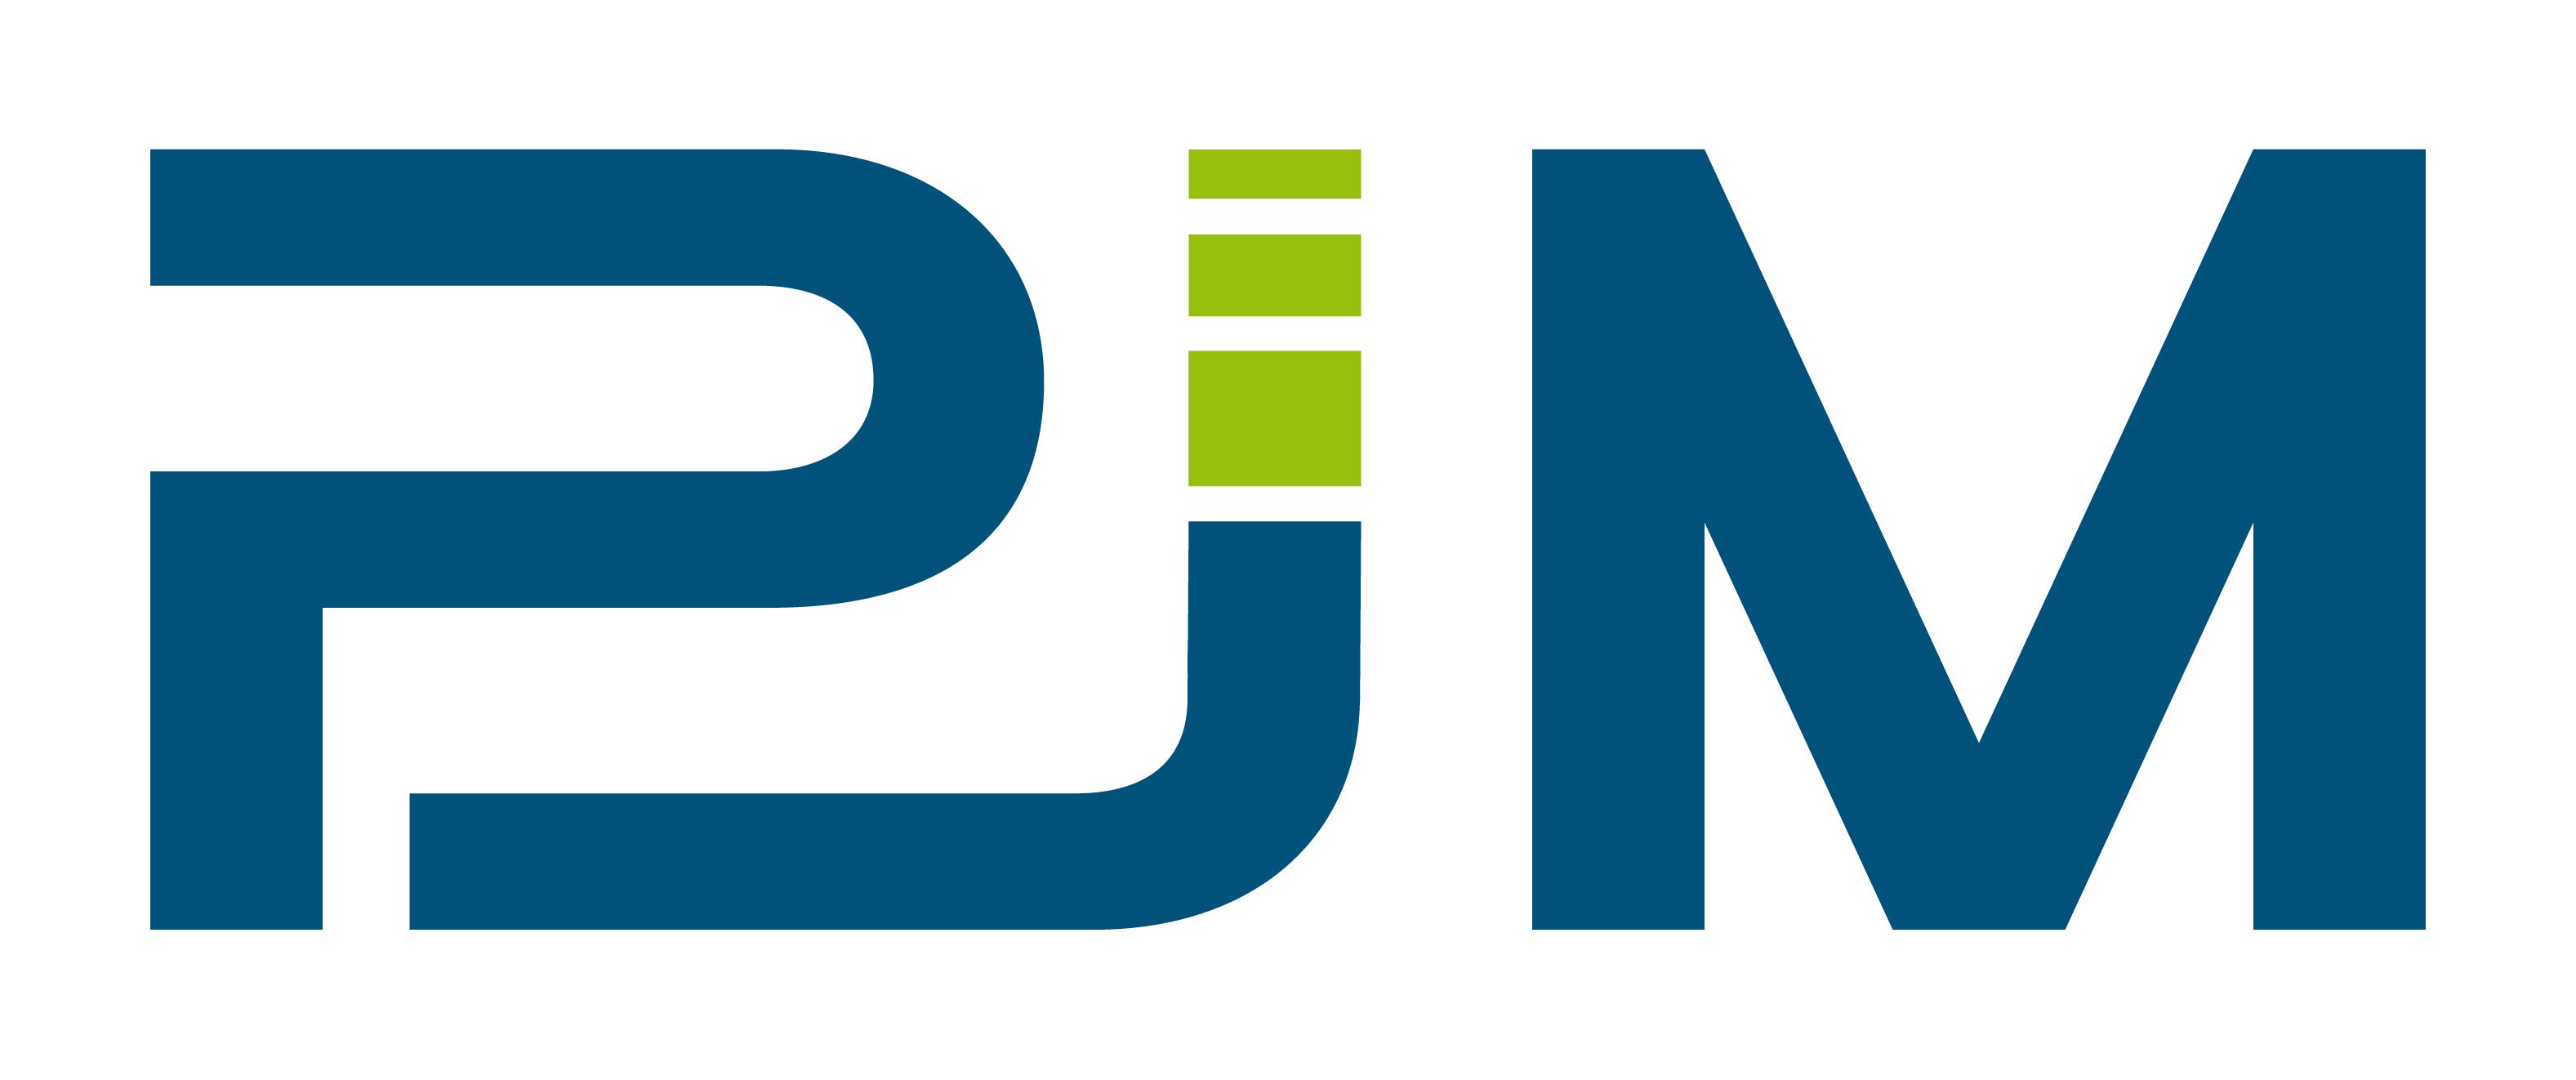 PJ Messtechnik GmbH